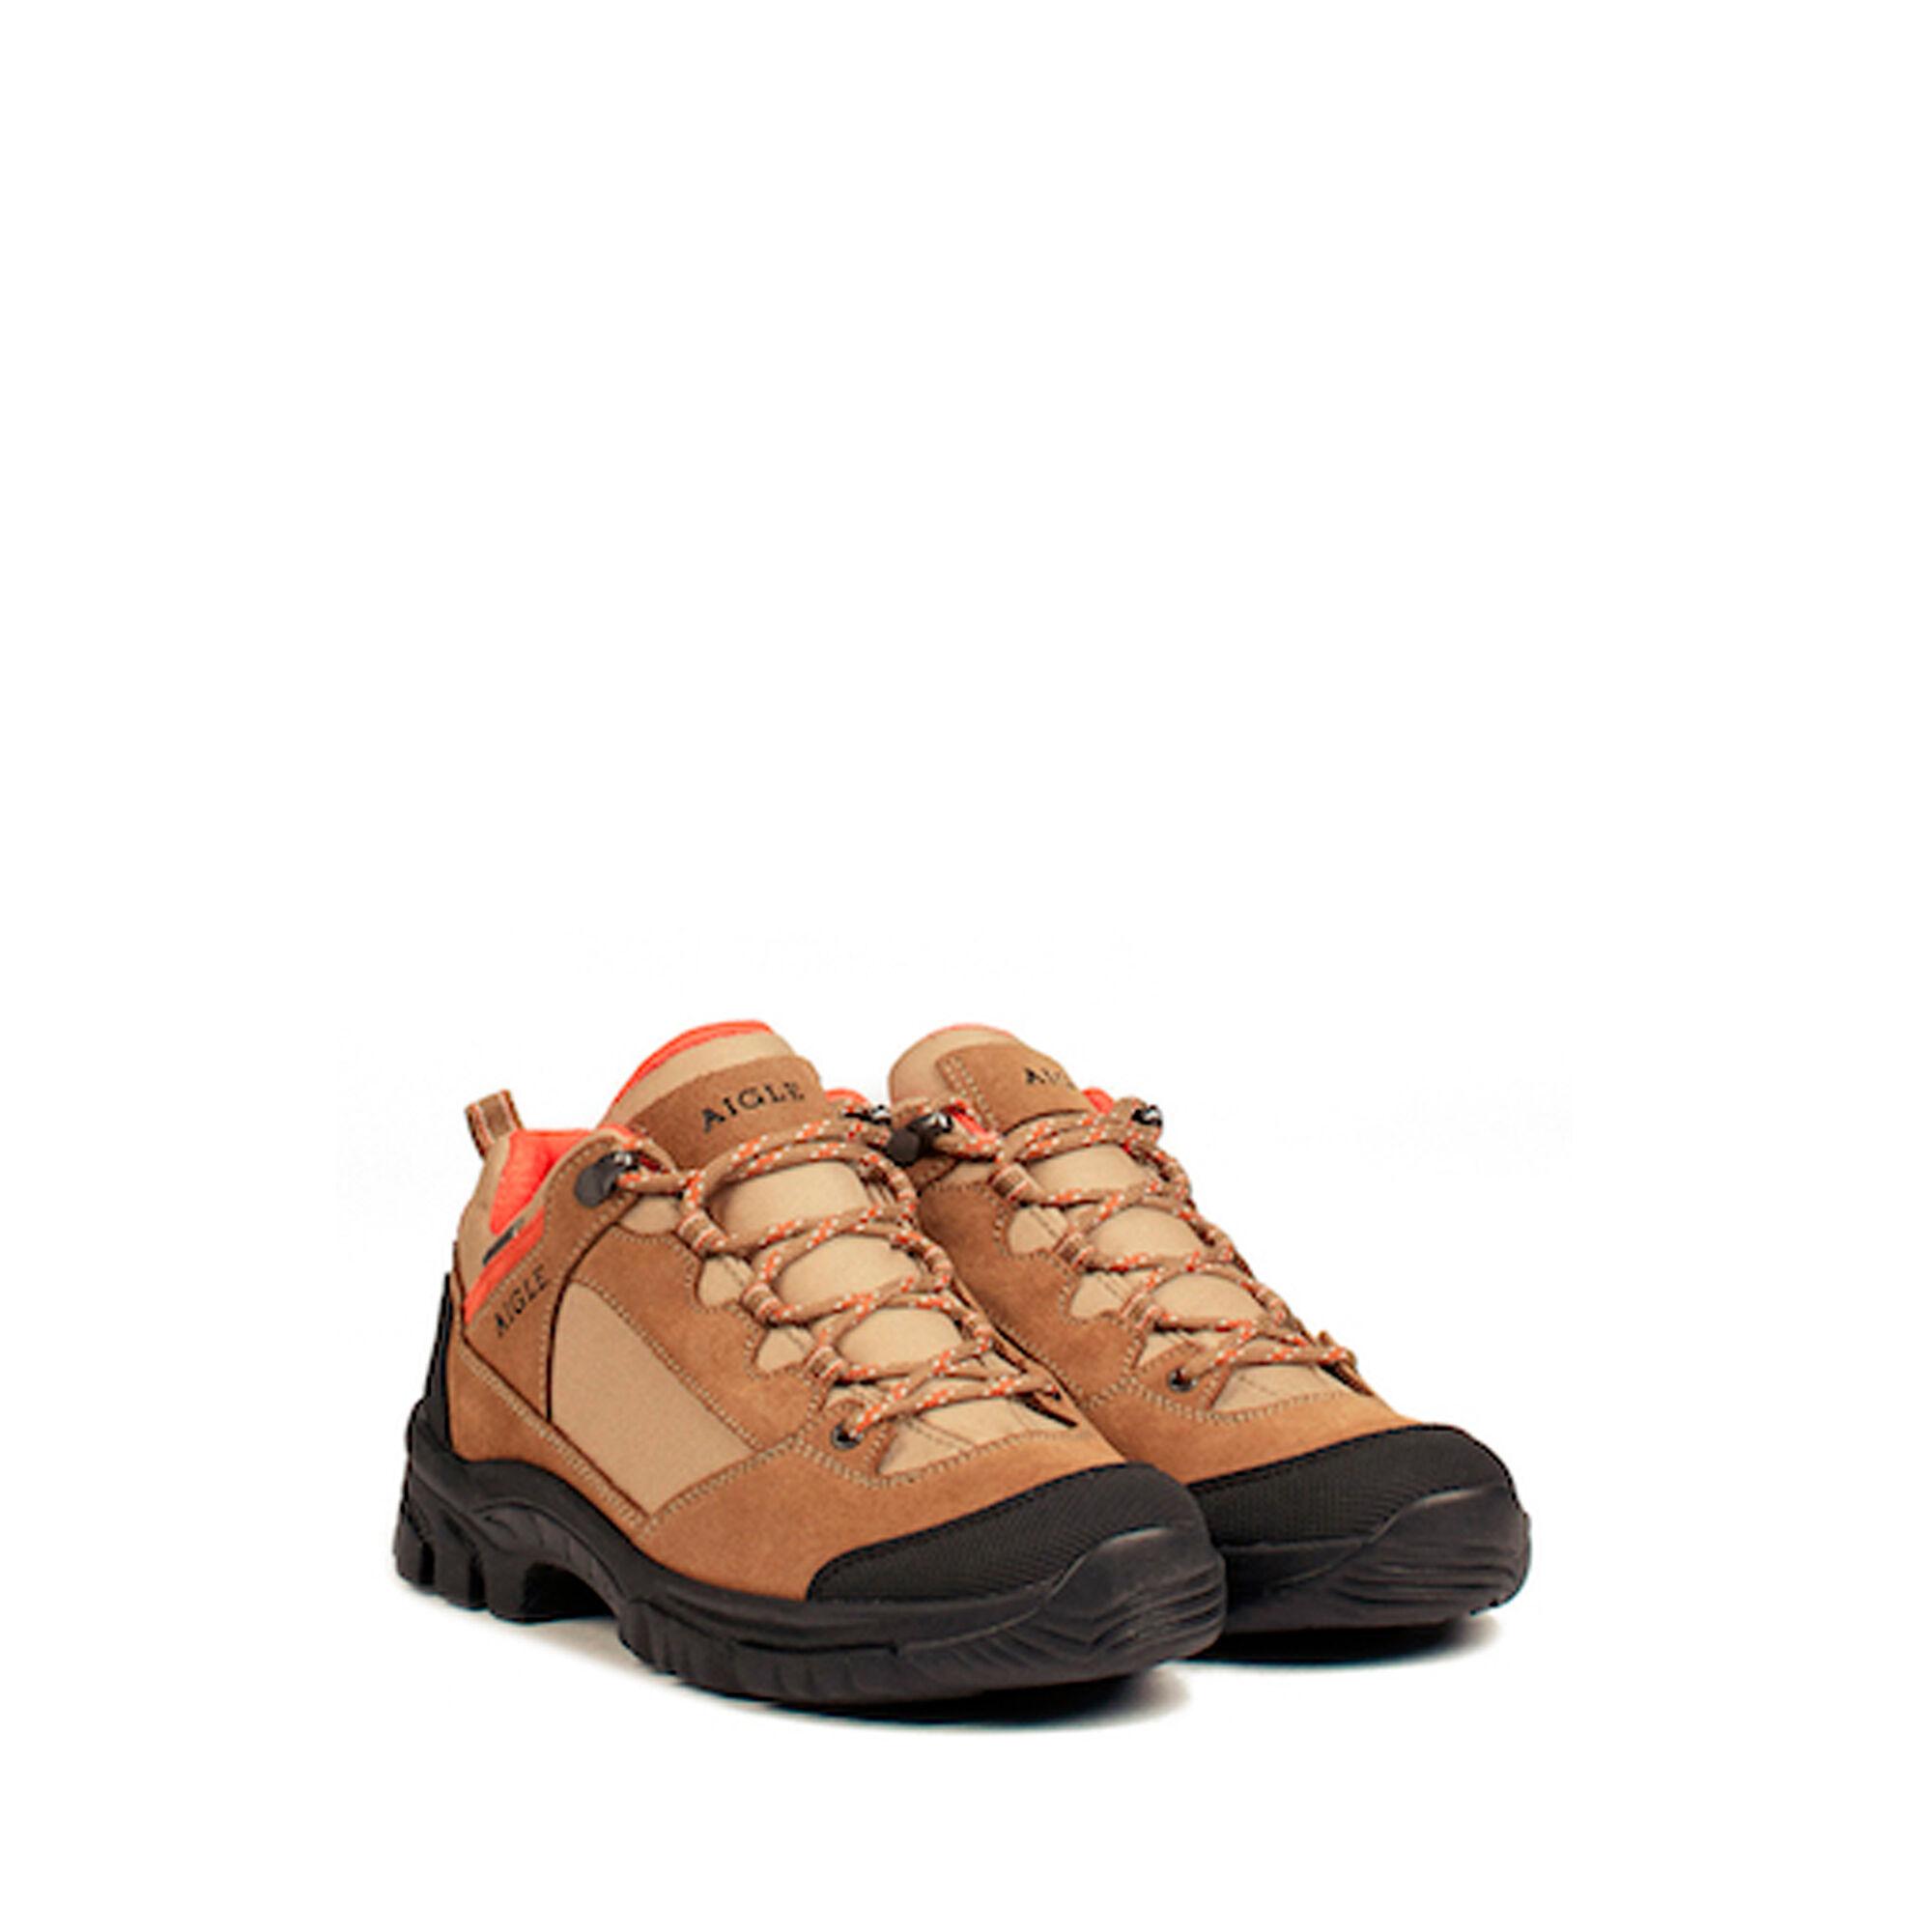 Aigle Chaussures ARVEN LOW Beige CxMq8a